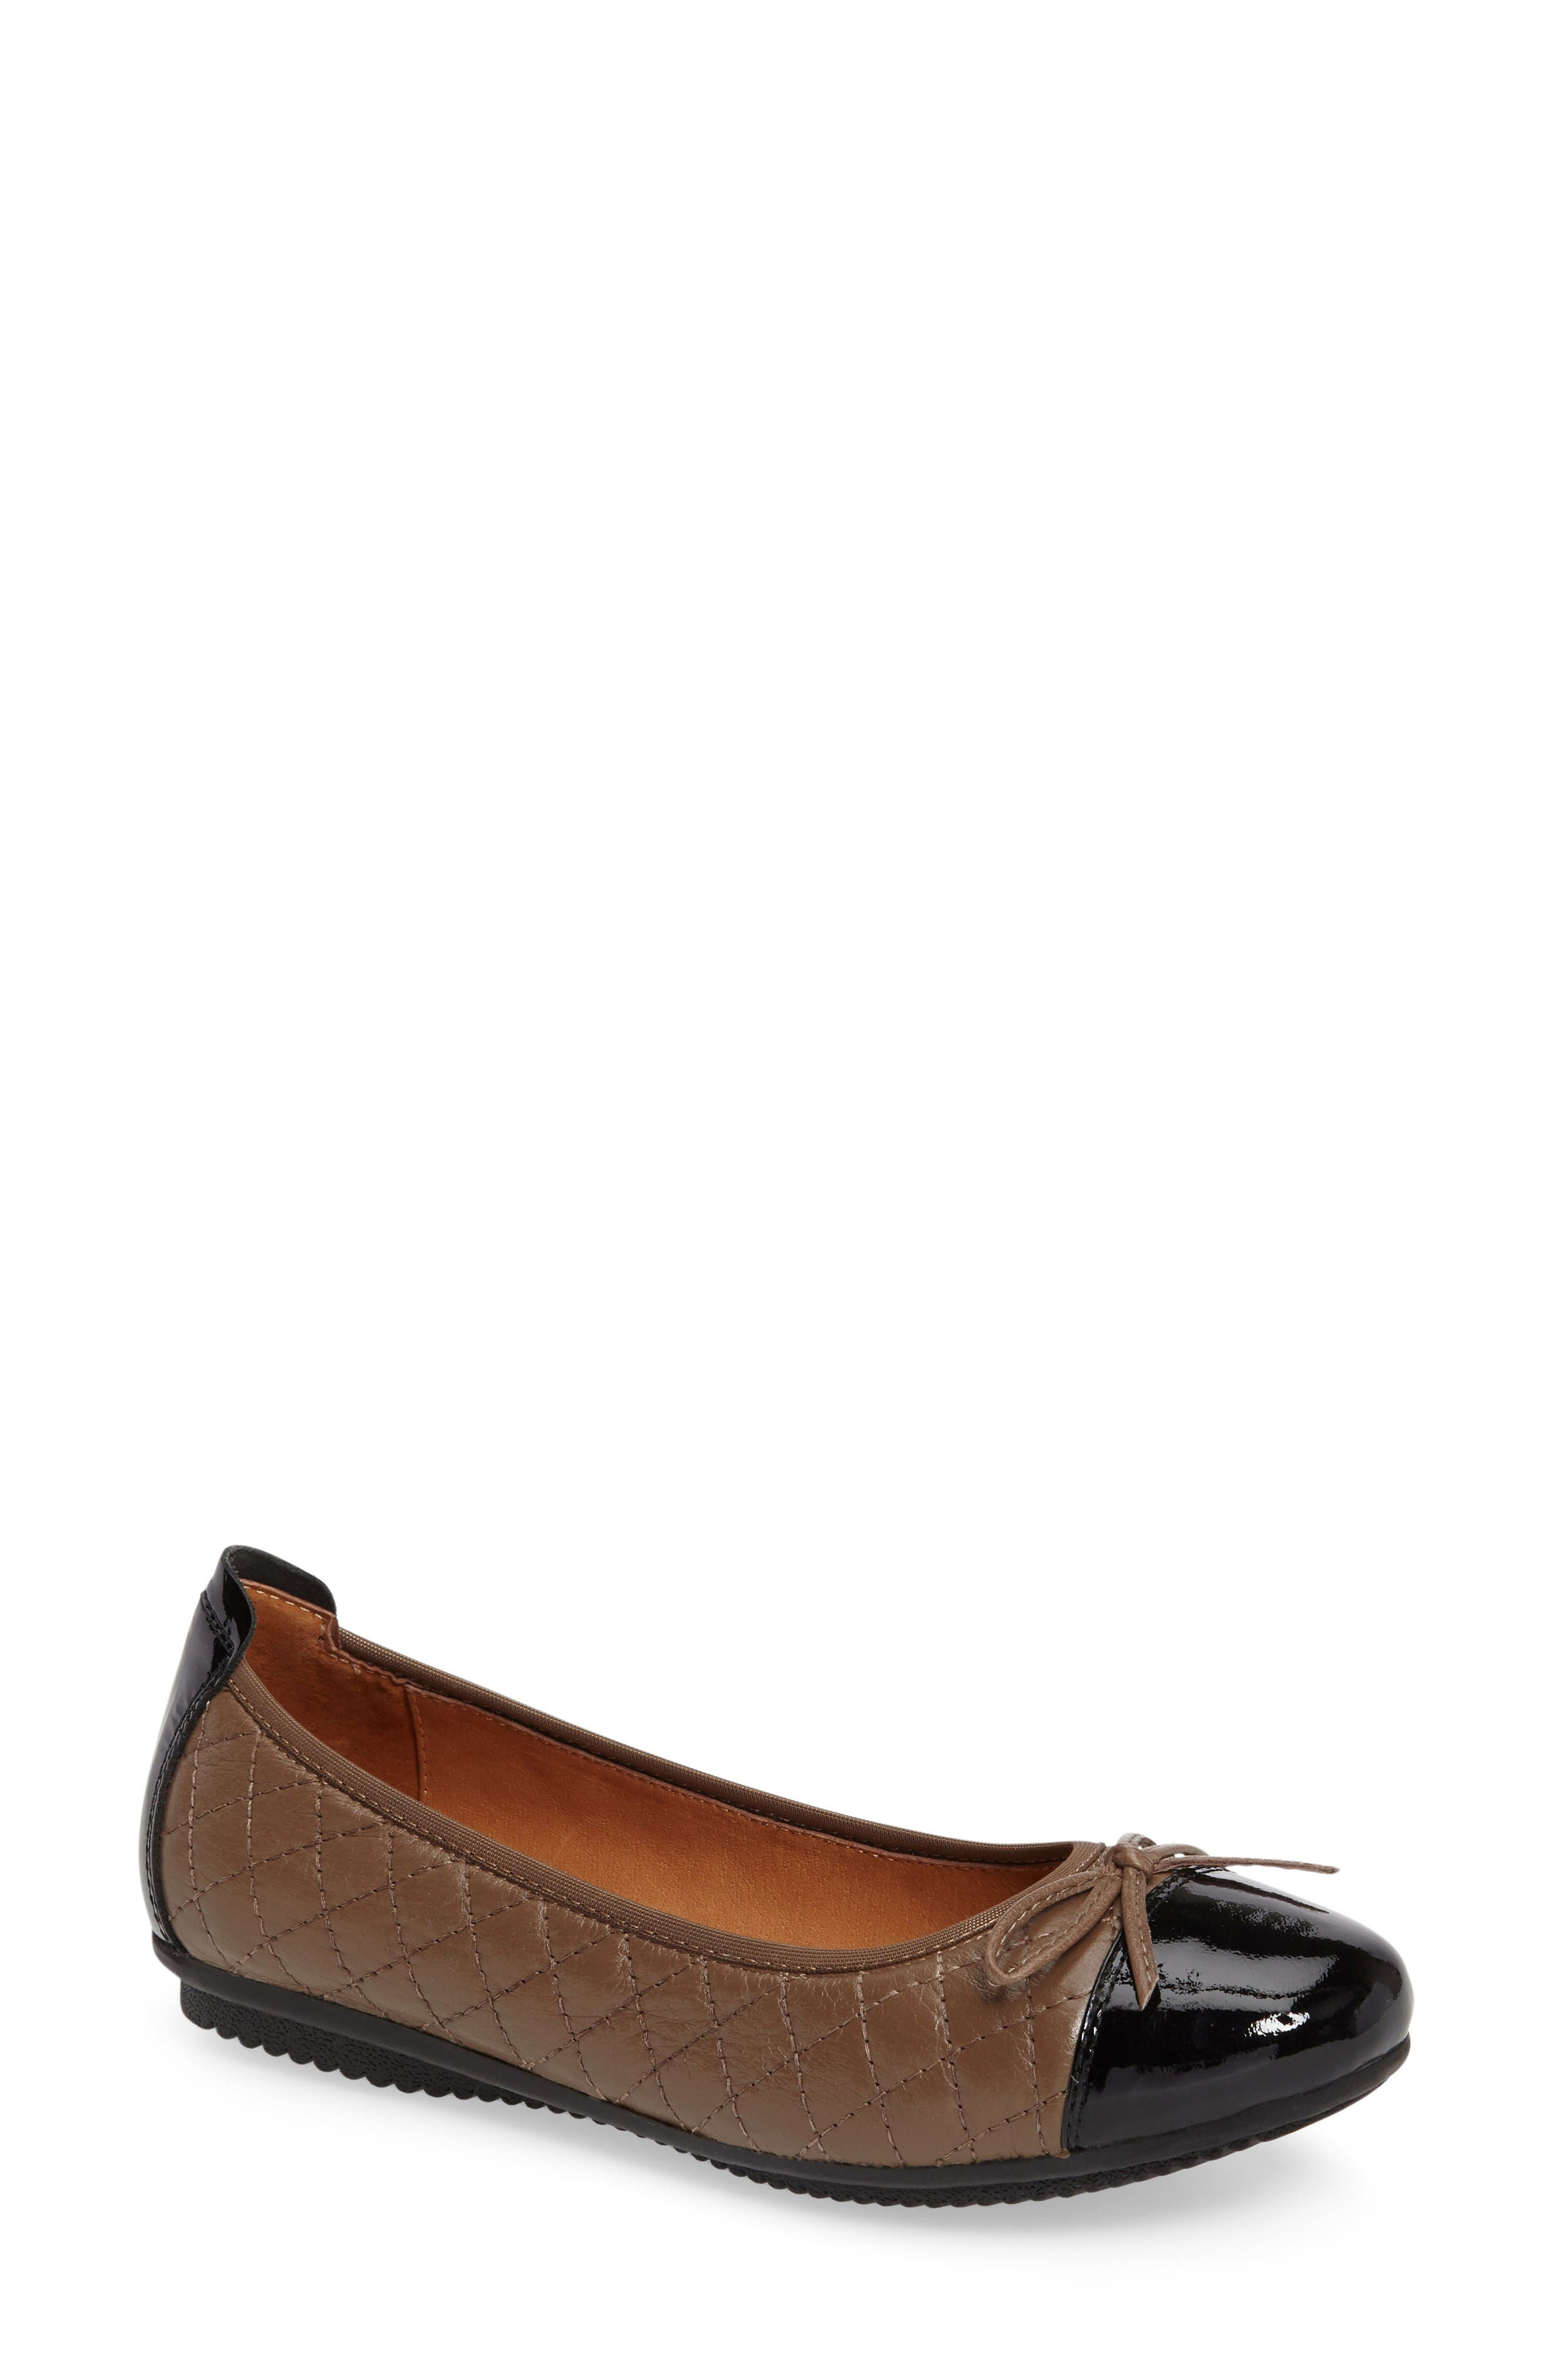 'Pippa 25' Cap Toe Flat,                         Main,                         color, Taupe/ Black Leather